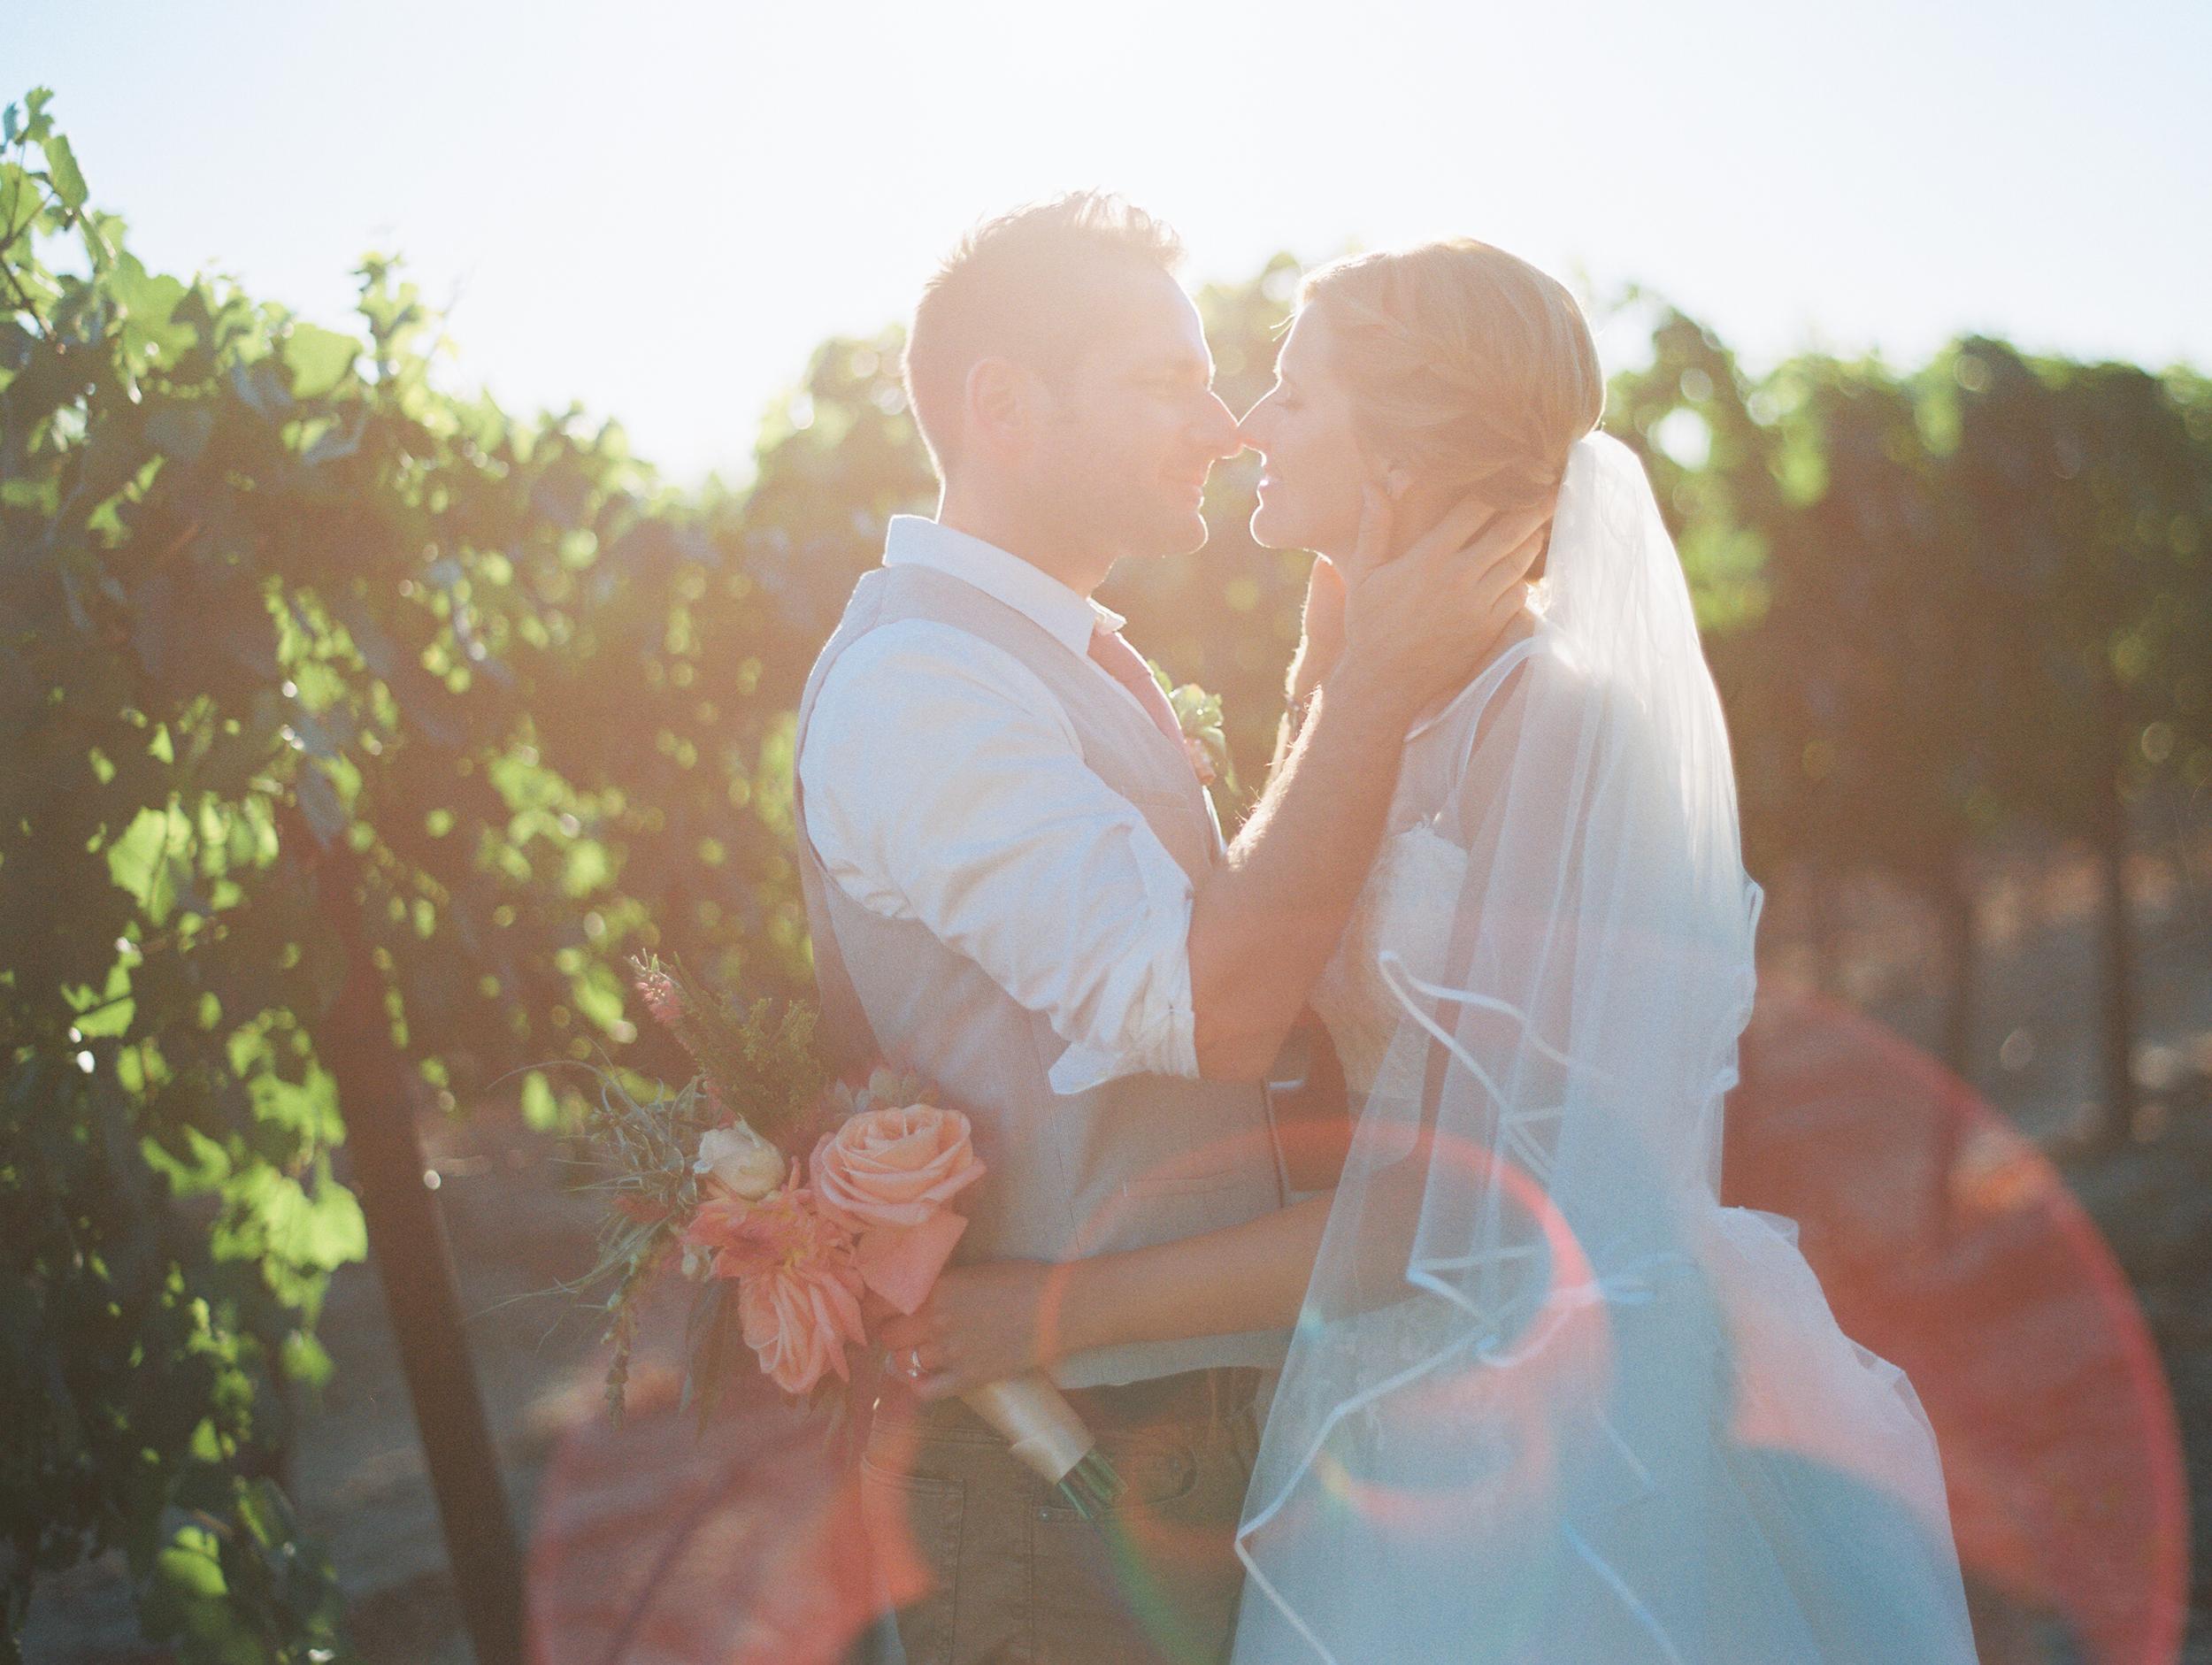 Anders Wedding by Jessica Garmon-387.JPG